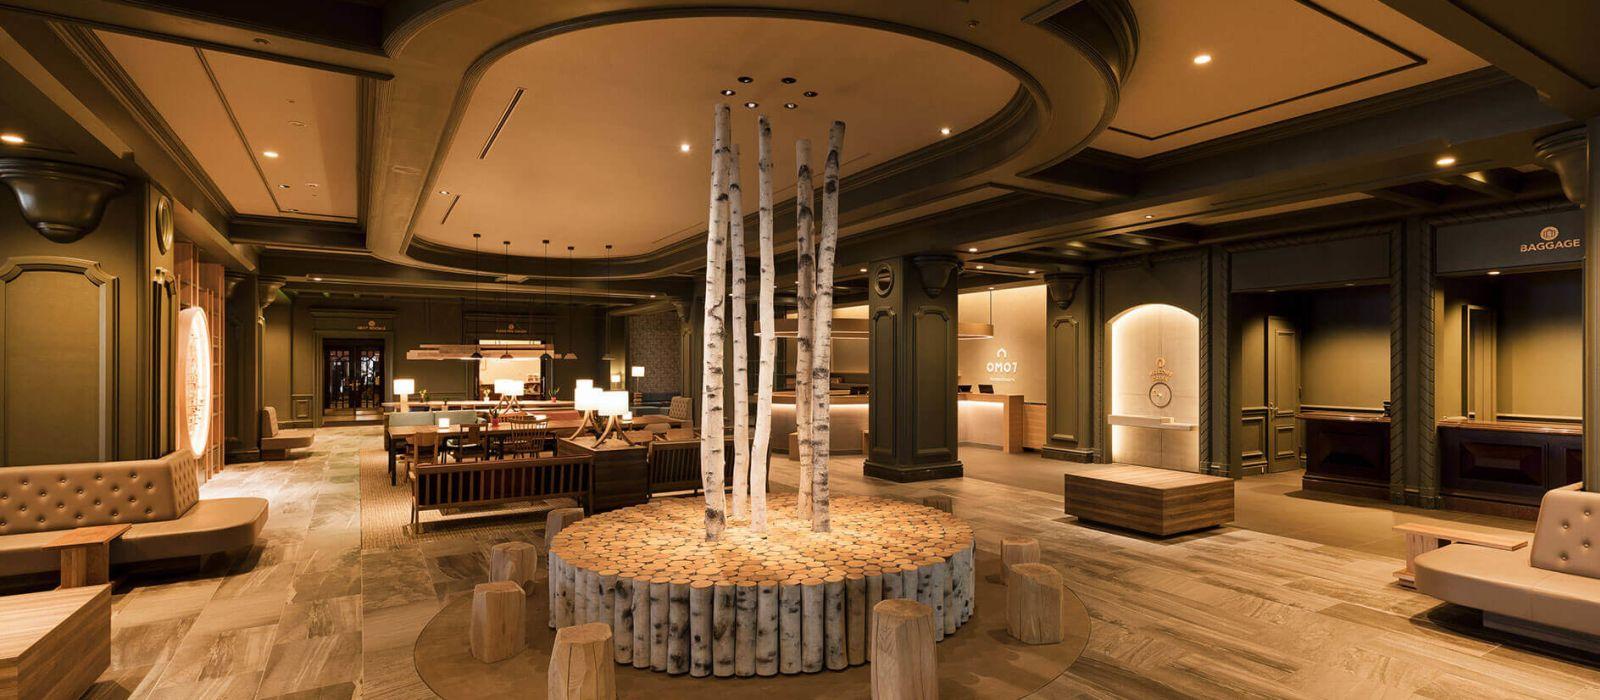 Hotel Hoshino Resorts OMO7 Asahikawa Japan